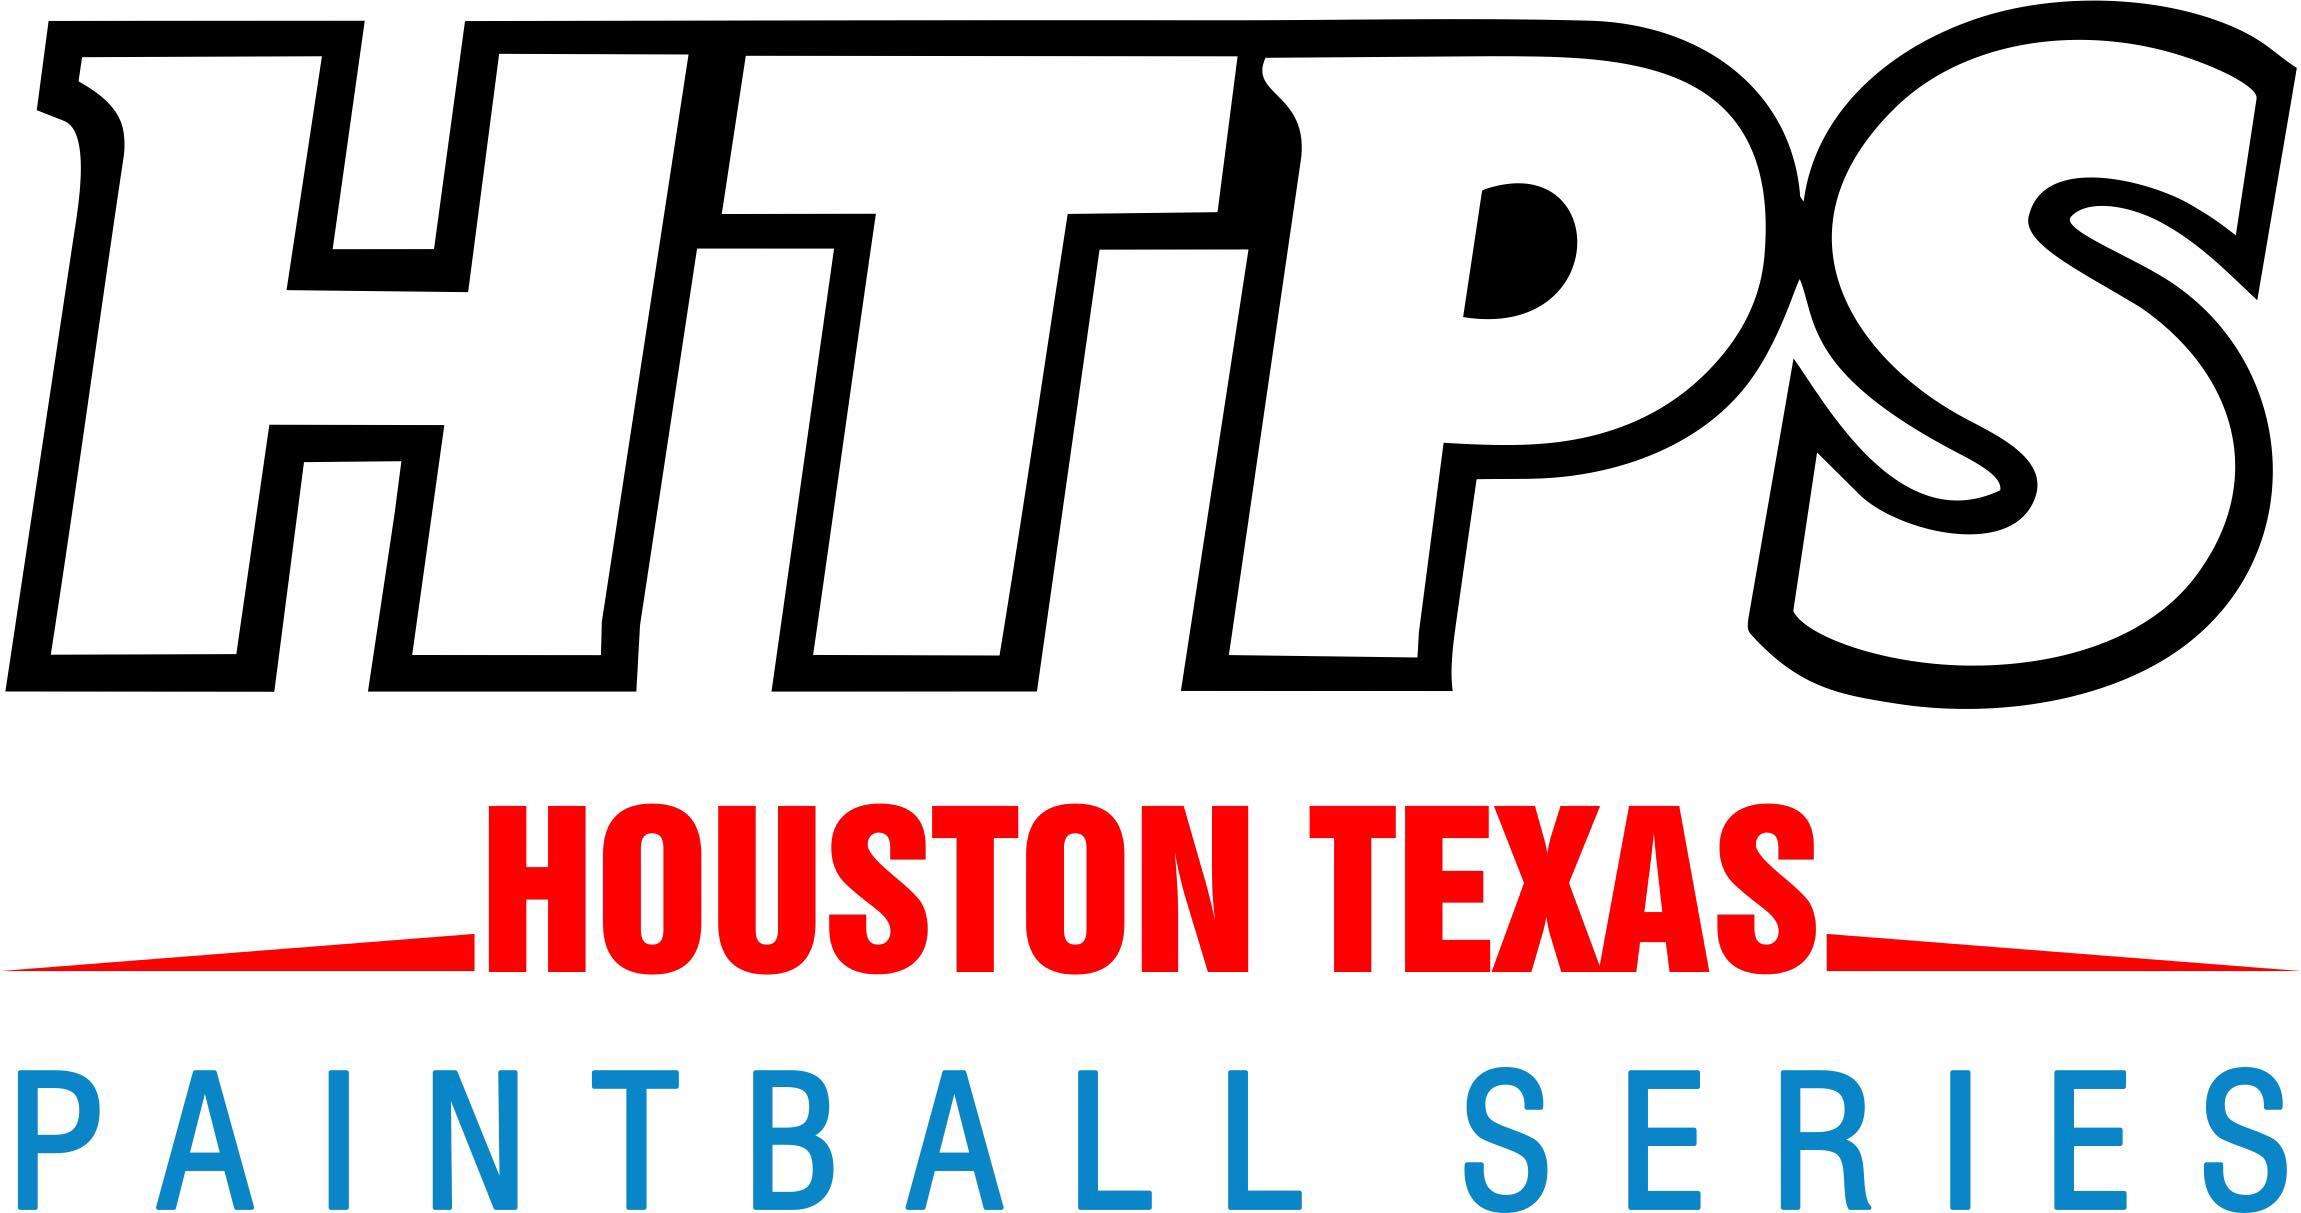 Houston Texas Paintball Series